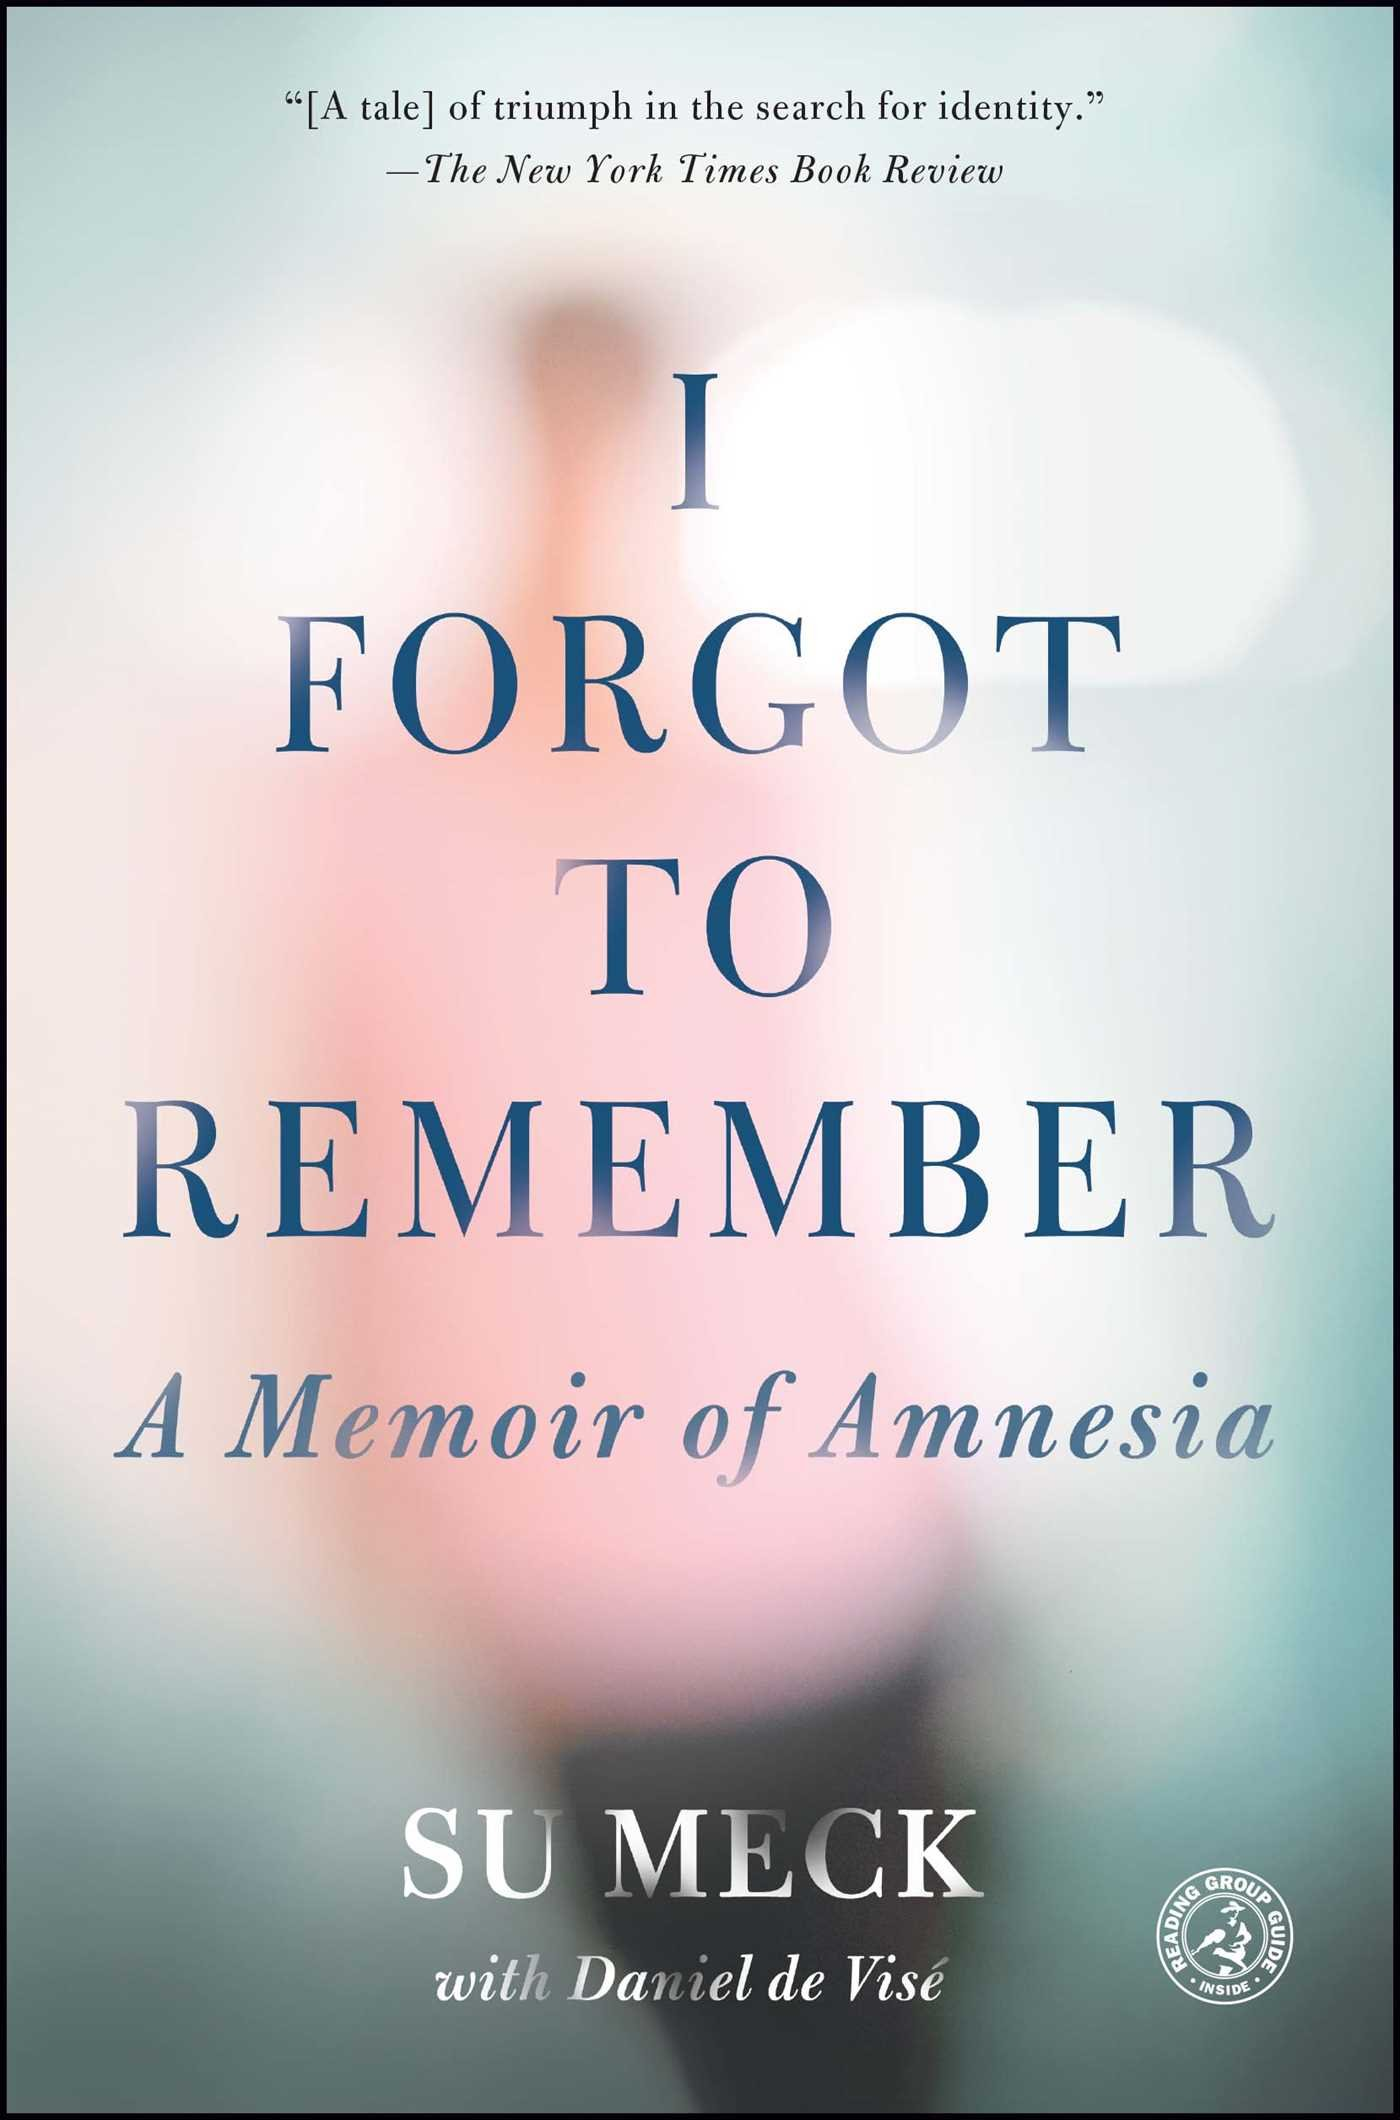 I Forgot To Remember: A Memoir Of Amnesia (simon & Schuster Nonfiction  Original Hardcover): Su Meck, Daniel De Vis�: 9781451685824: Amazon:  Books